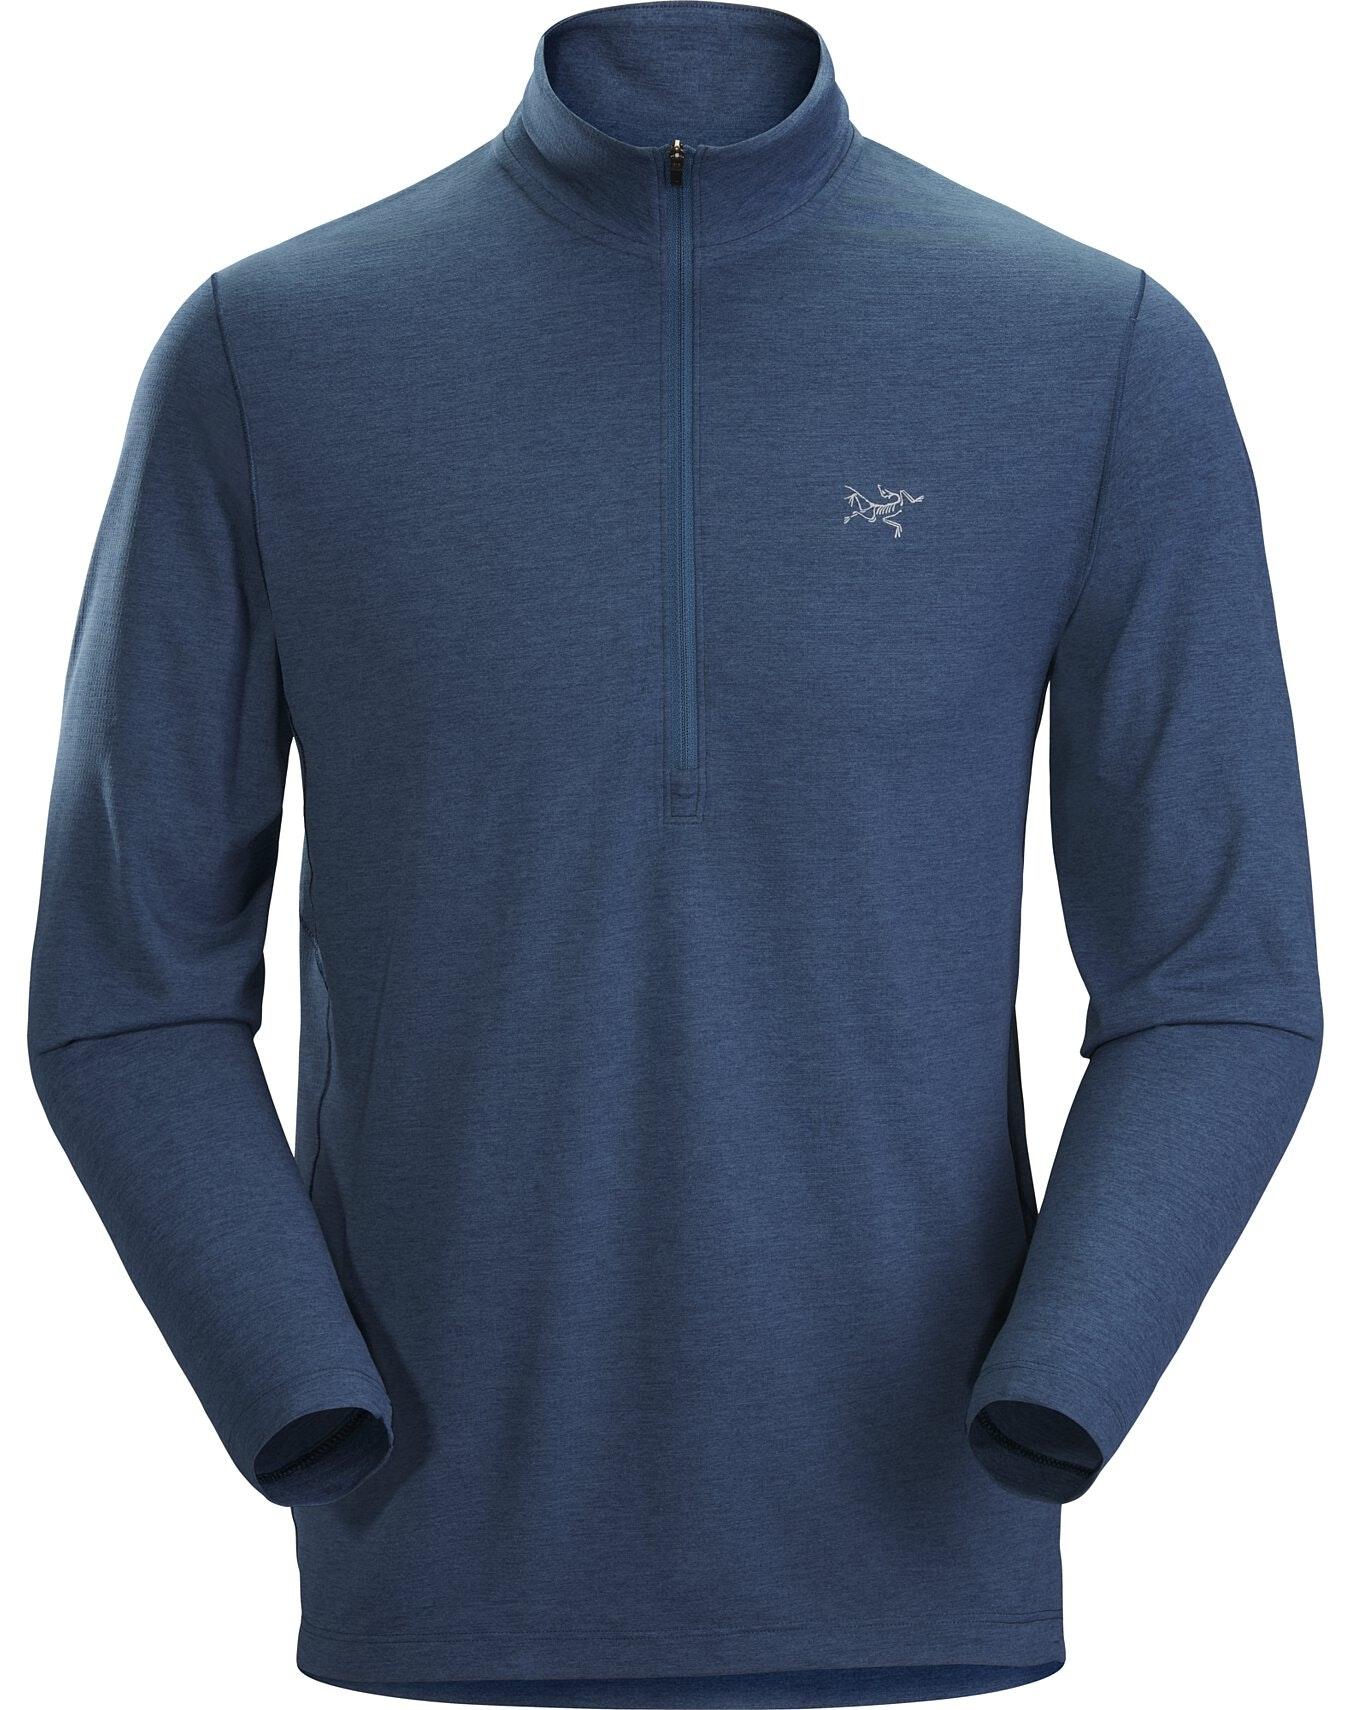 Cormac Zip Neck Shirt LS Ladon